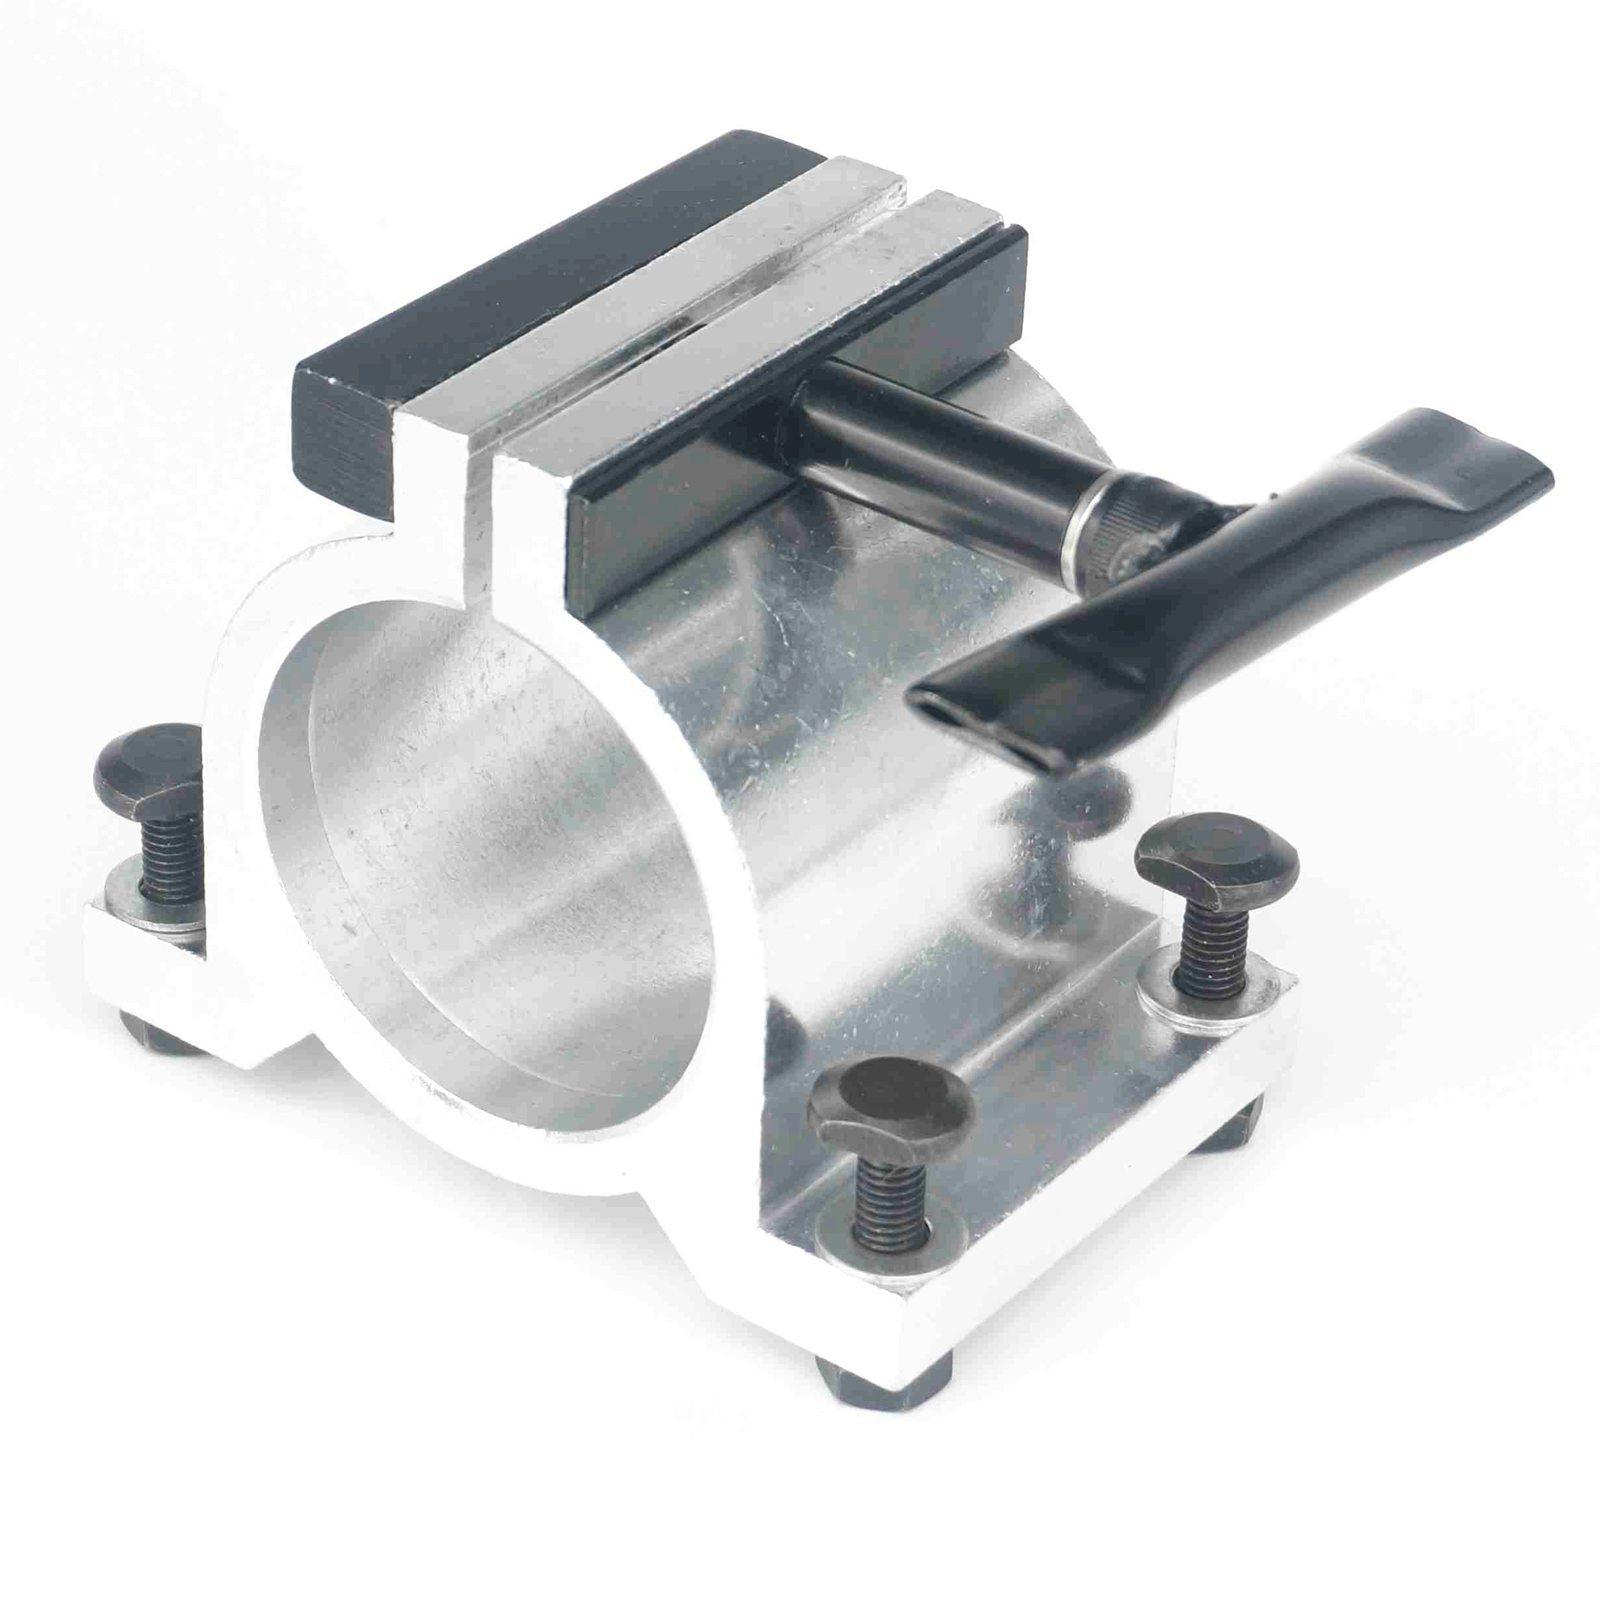 65mm Diameter Silvery Aluminum CNC Spindle Motor Holder Mount Bracket Clamp Cast Adjustable Handle Engraving Machine